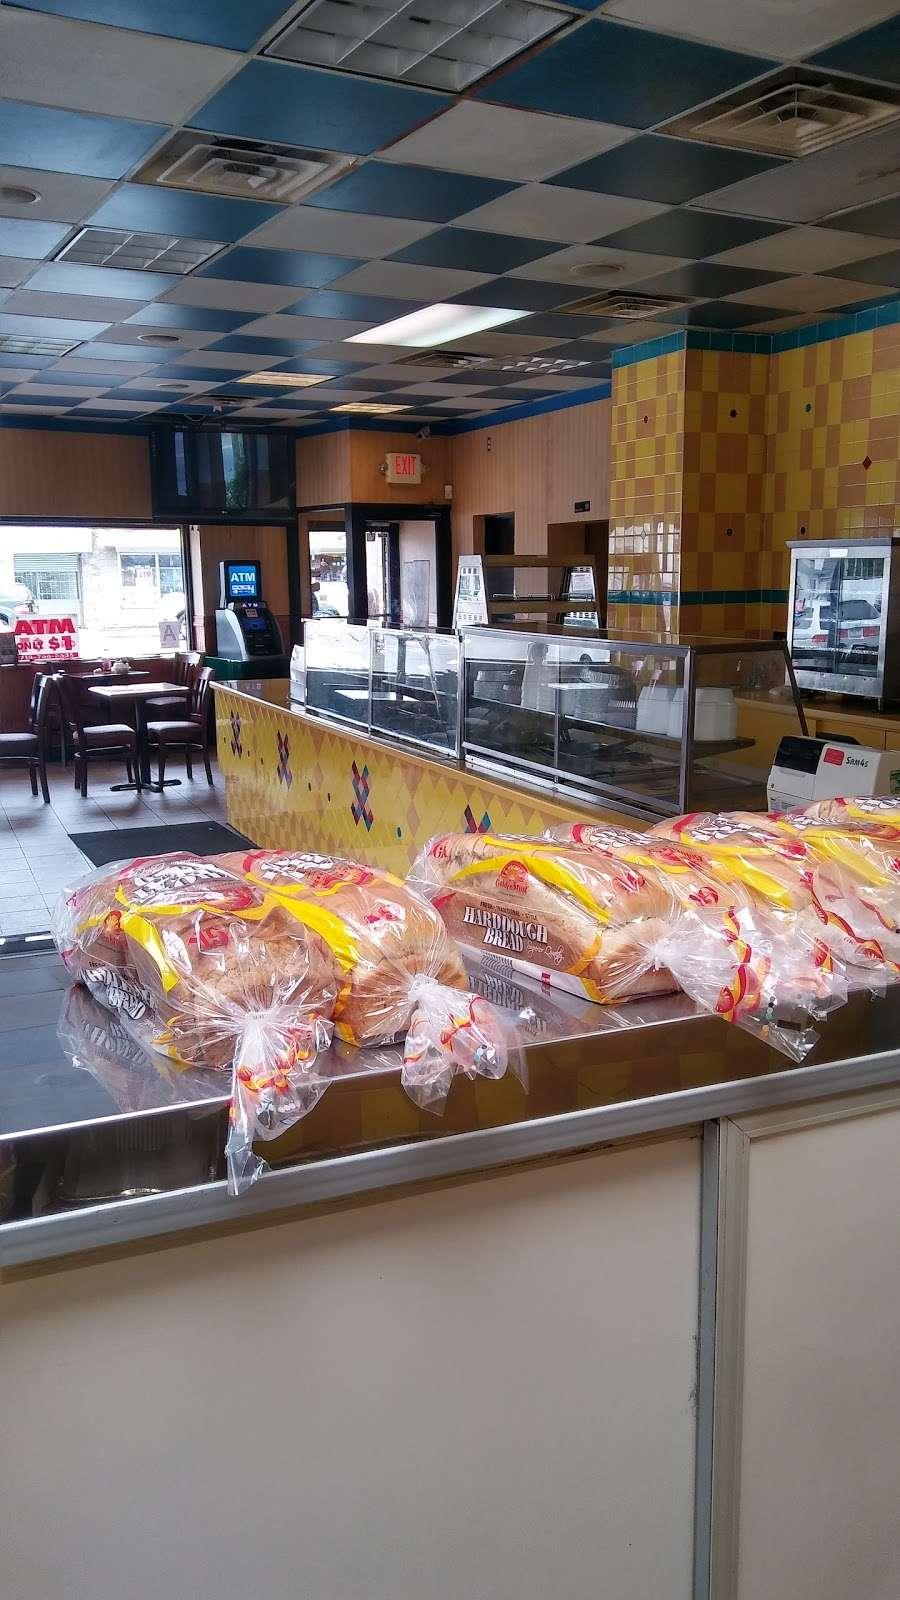 Golden Krust - restaurant  | Photo 1 of 4 | Address: 135-58 Brookville Blvd, Rosedale, NY 11422, USA | Phone: (718) 341-2011